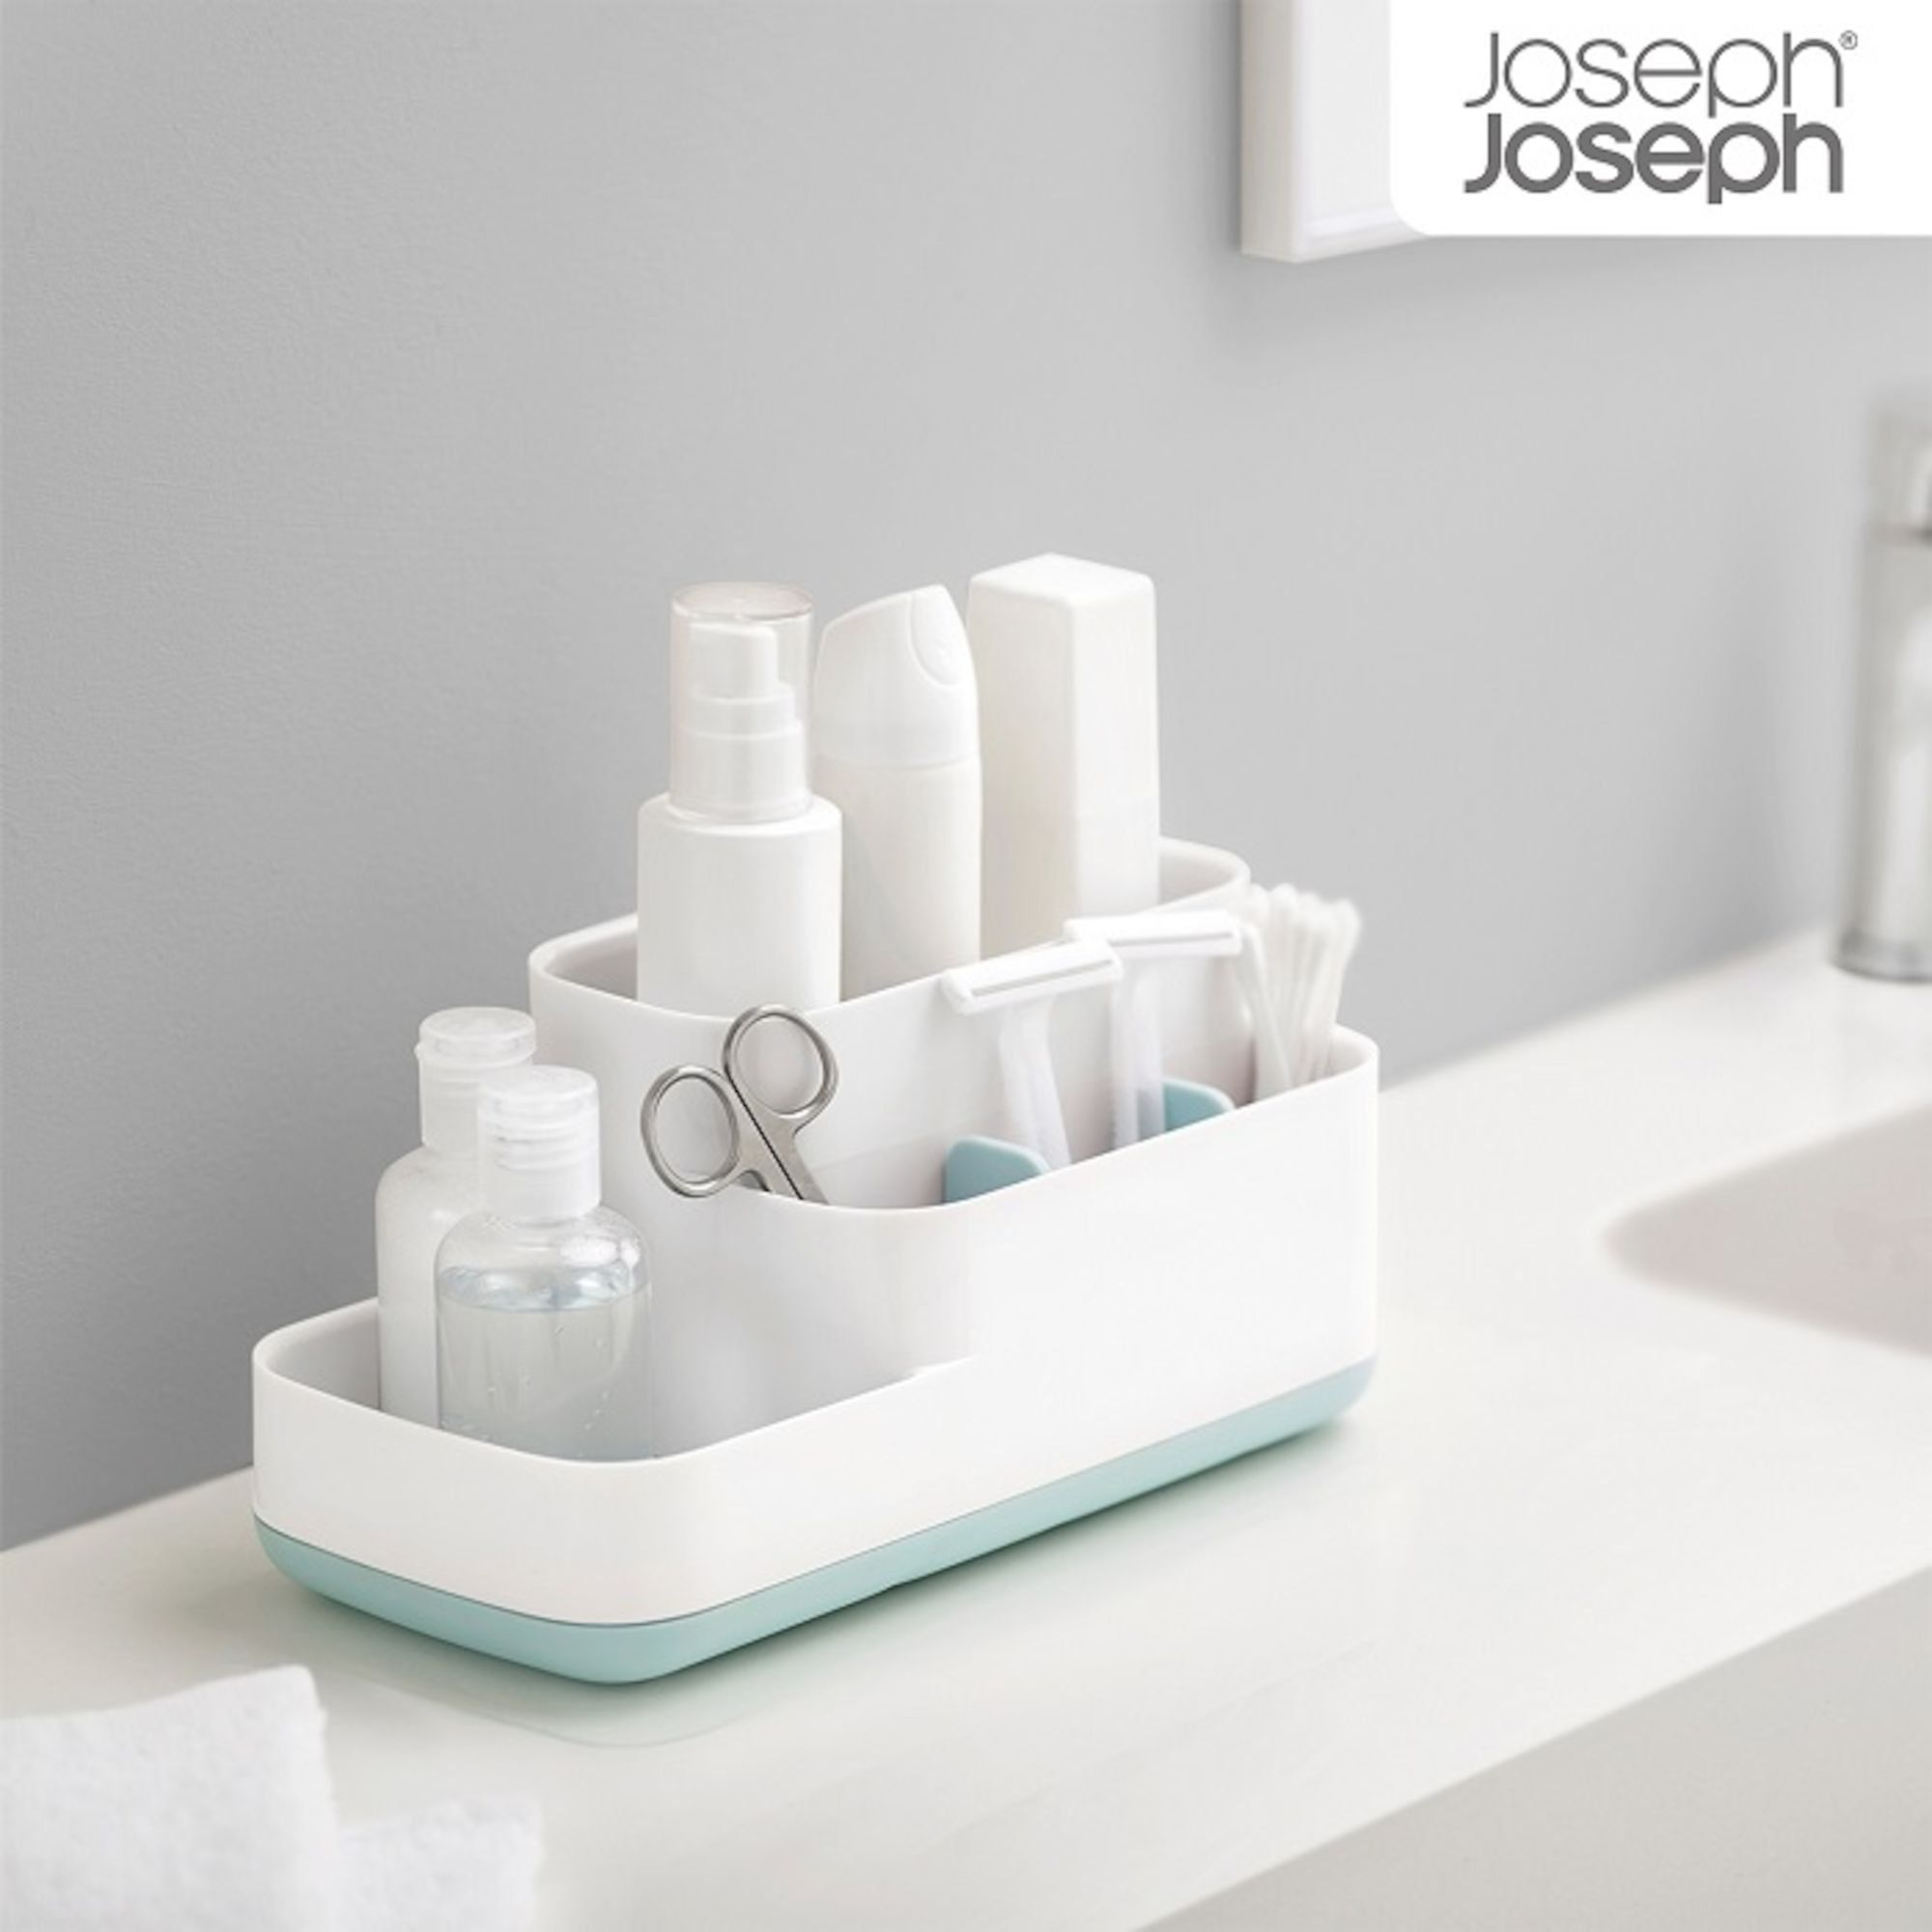 Joseph Joseph Easystore Bathroom Caddy Bathroom Caddy Bathroom Decor Accessories Bathroom Accessories